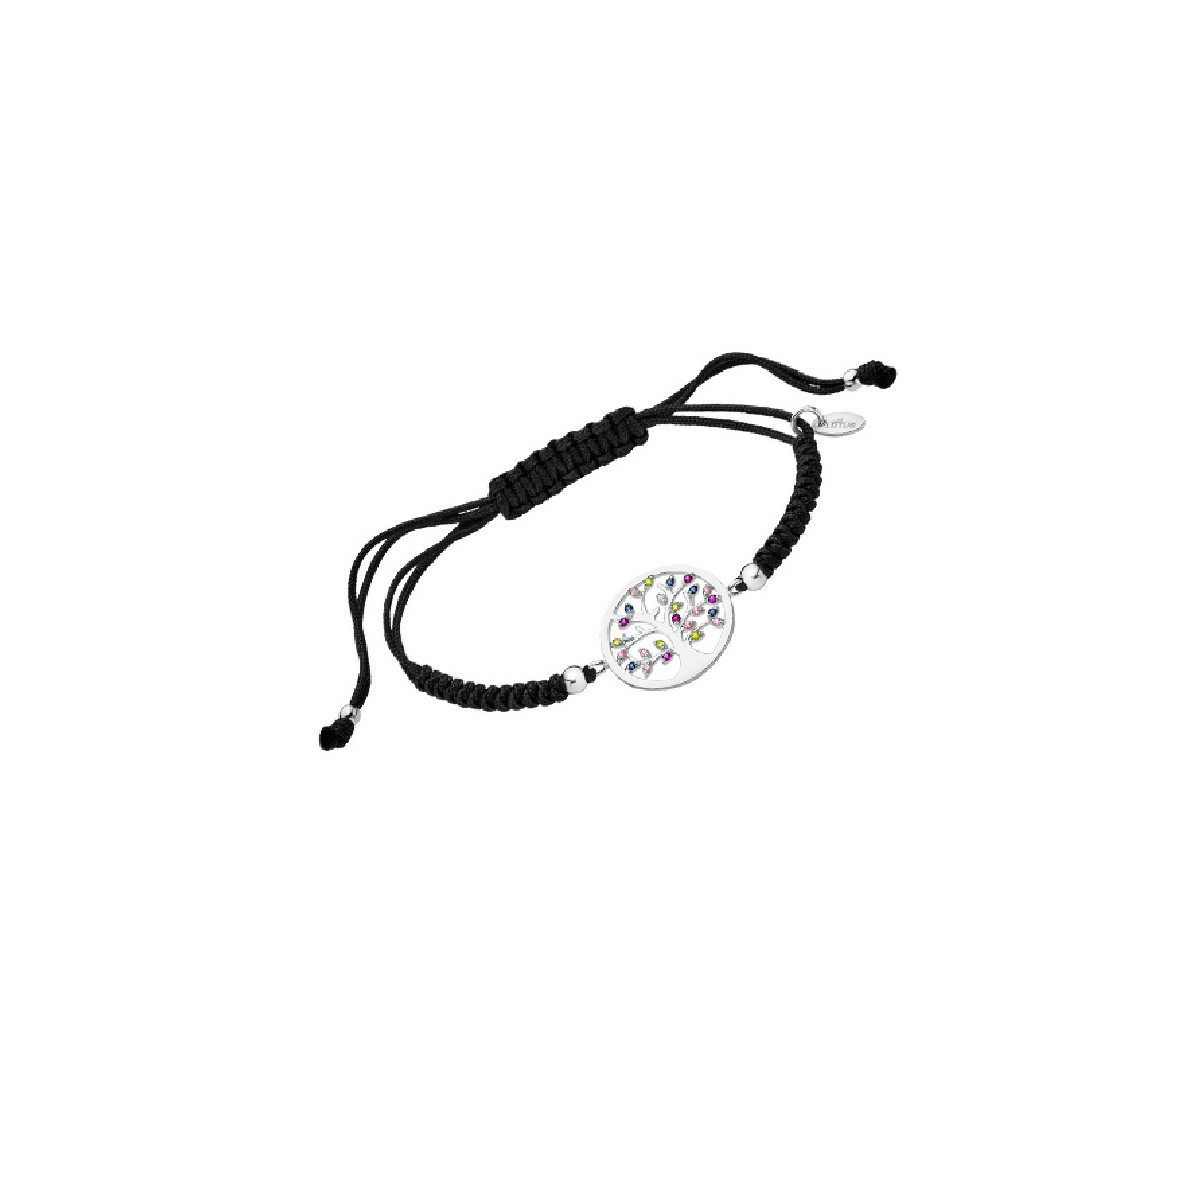 Lotus Silver Pulsera Sra.arbol.hilo.colo - LP1890-2/3